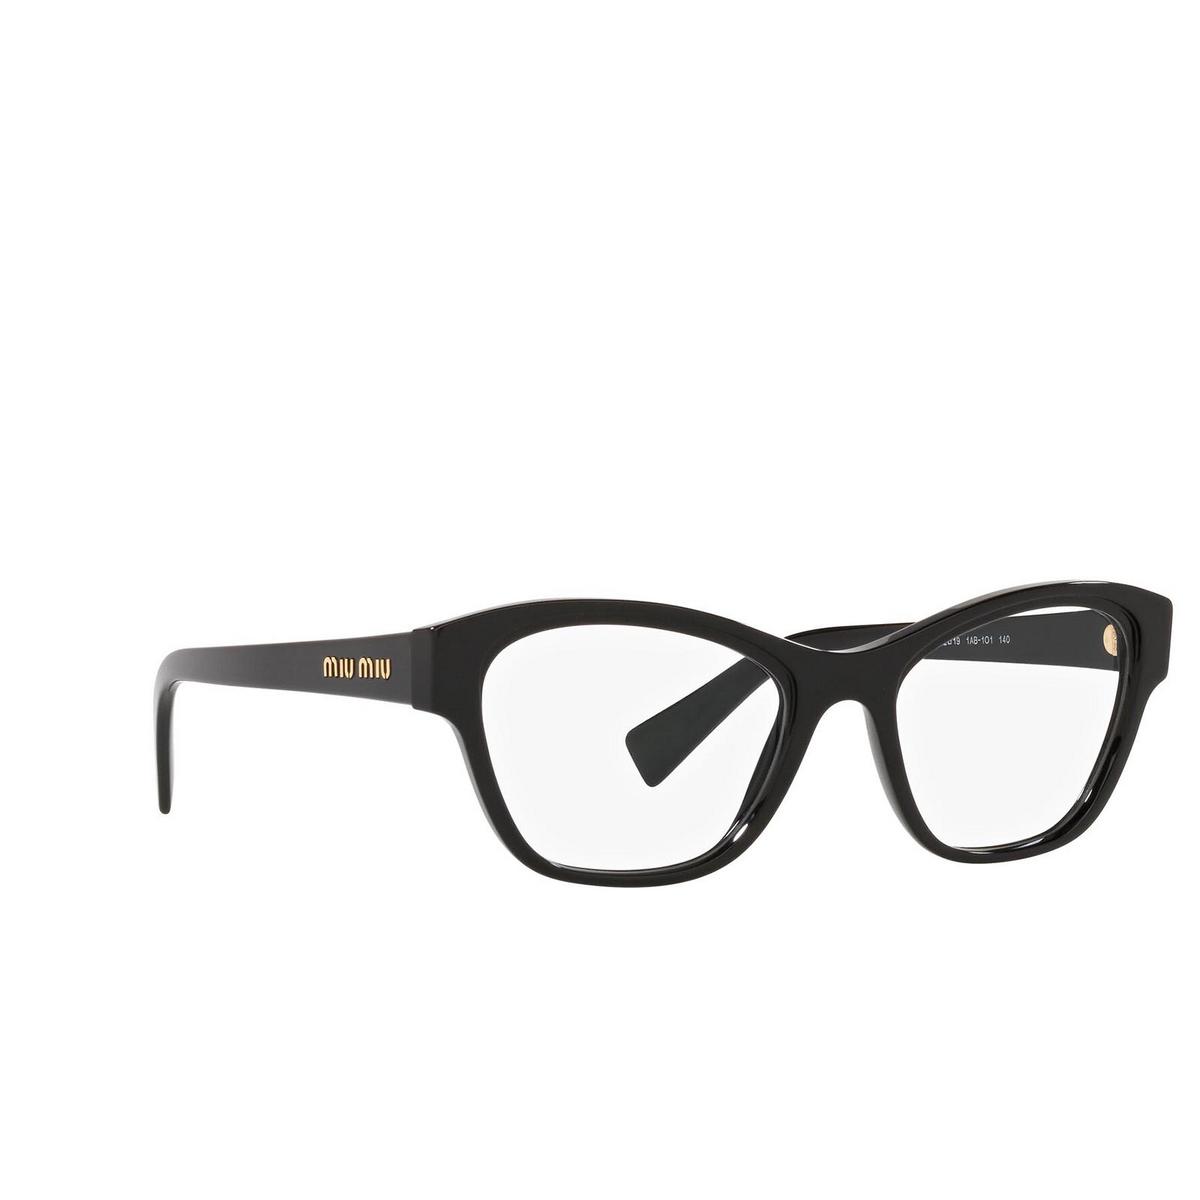 Miu Miu® Irregular Eyeglasses: MU 08TV color Black 1AB1O1.